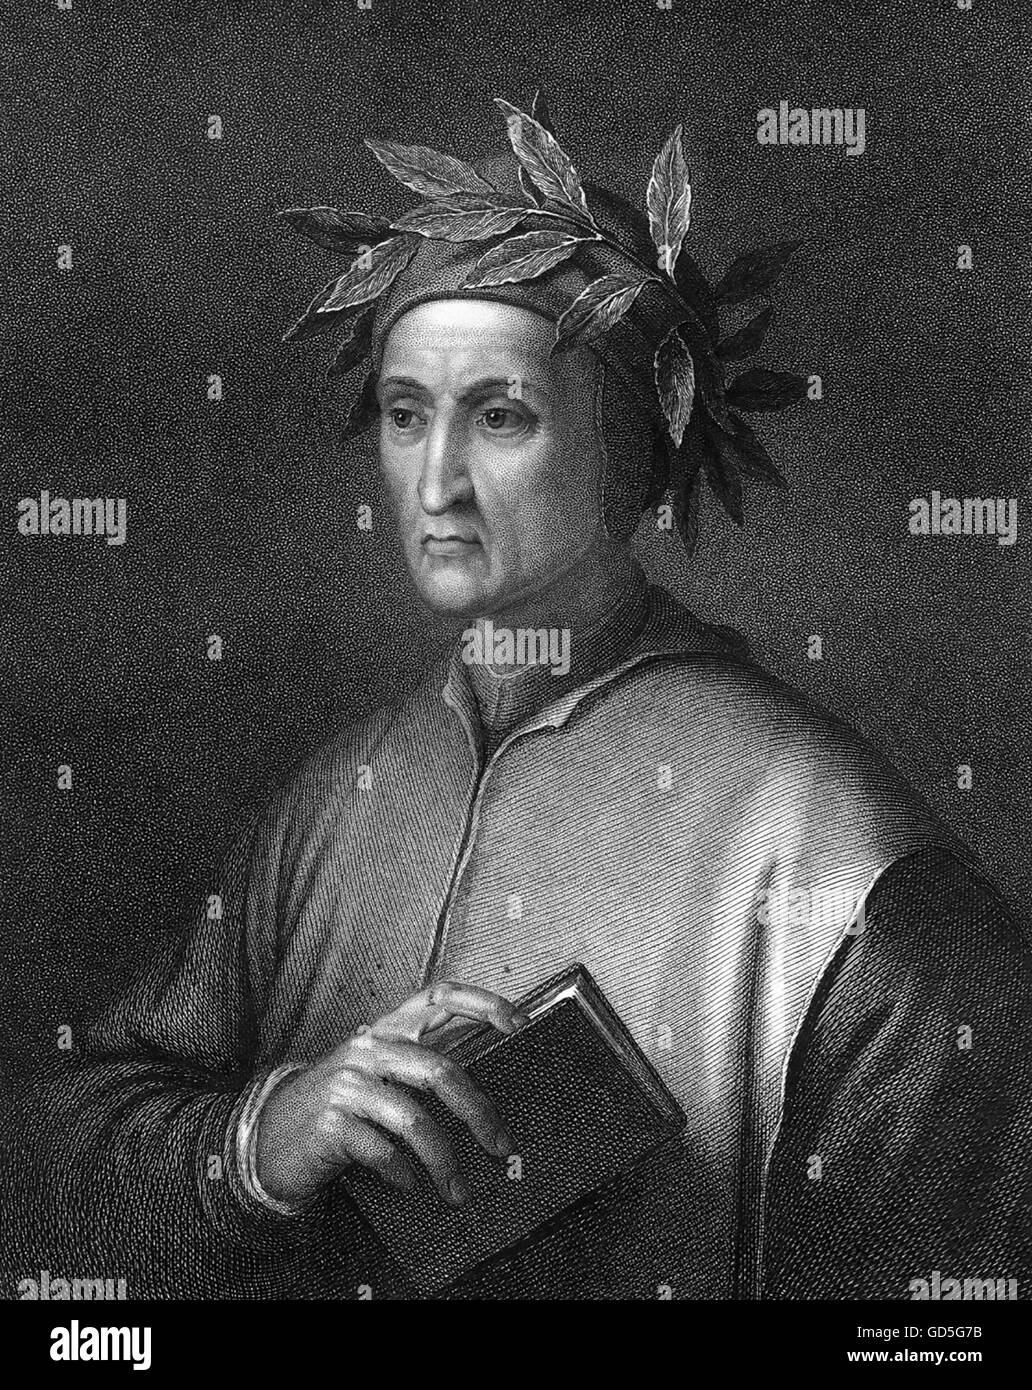 DANTE ALIGHIERI (c 1265-1321) Italian poet. 19th century steel engraving based on 1495 portrait by Botticelli - Stock Image